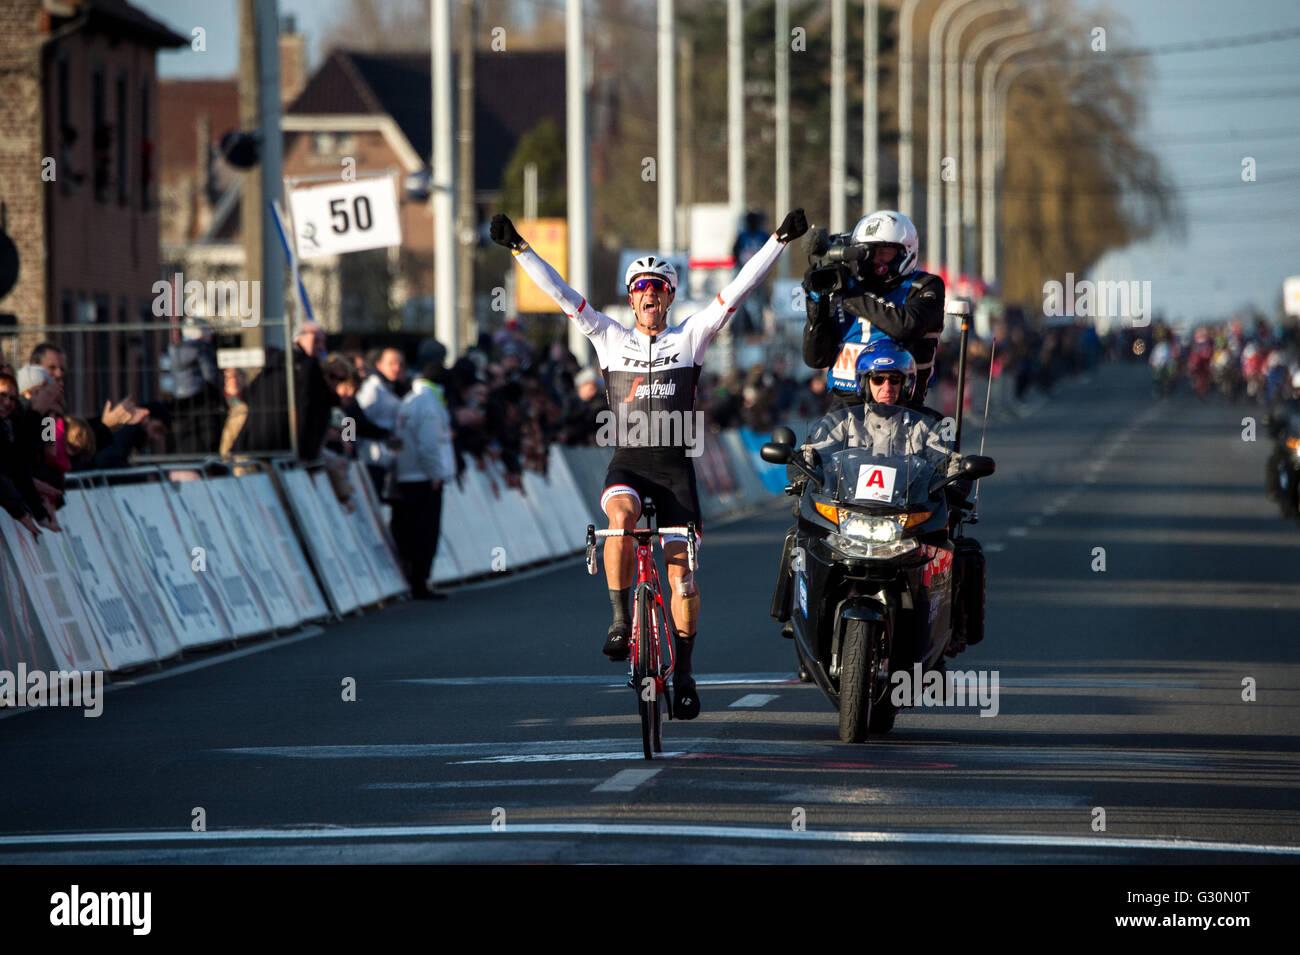 28/02/2016, Belgique. Jasper Stuyven (Trek Segafredo) célèbre remportant Kuurne-Bruxelles-Kuurne. Photo Stock